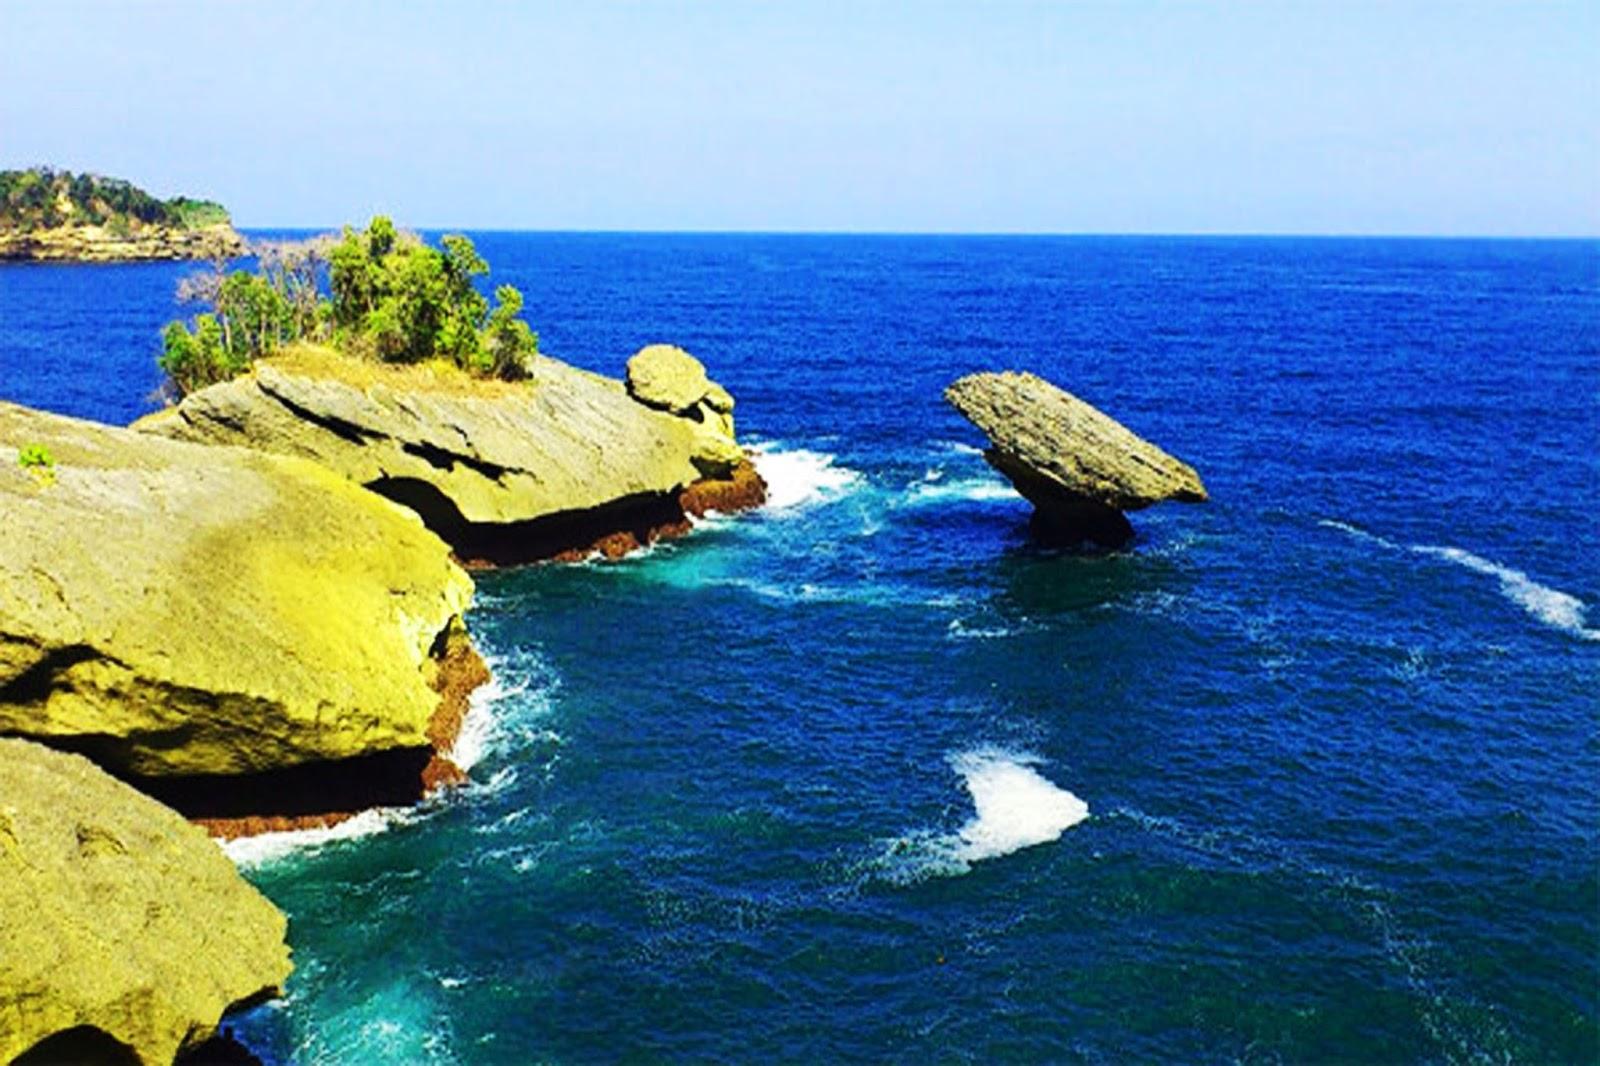 Wisata Pantai Popoh Tulungagung, Asyiknya Liburan Sambil ...